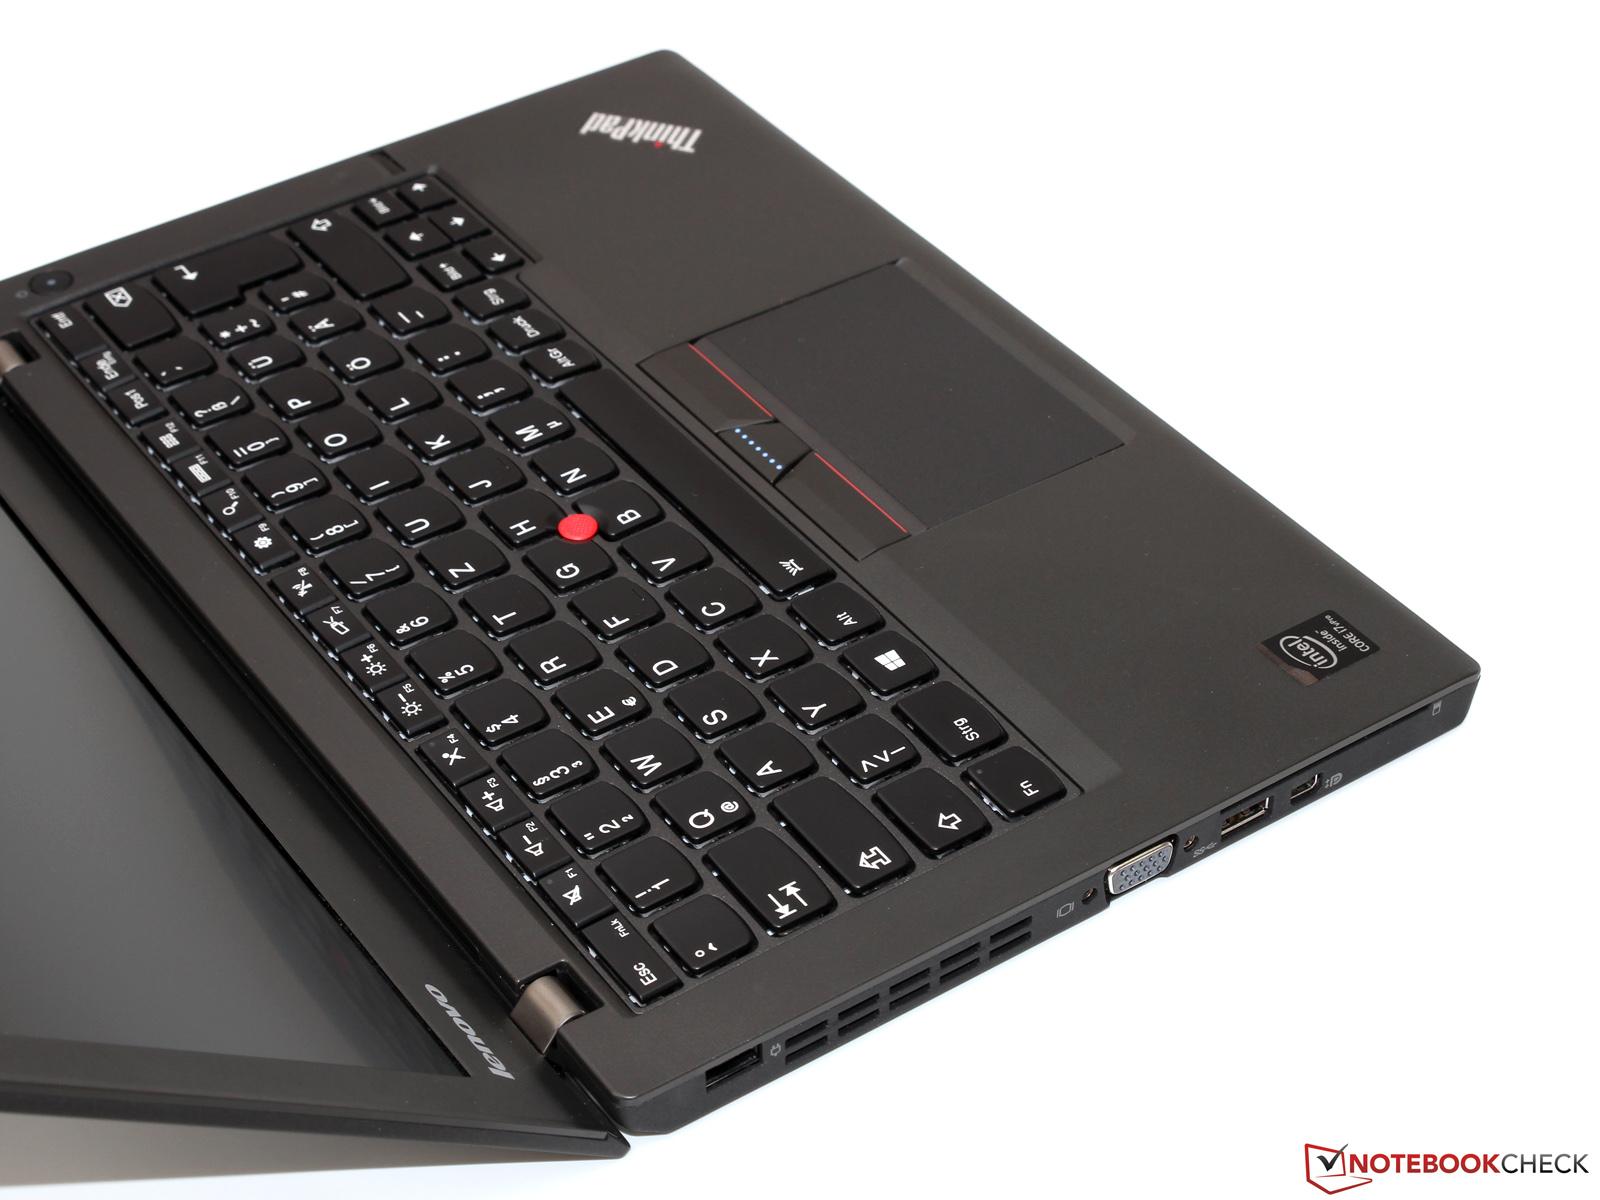 Lenovo ThinkPad X250 Ultrabook Review - NotebookCheck.net Reviews